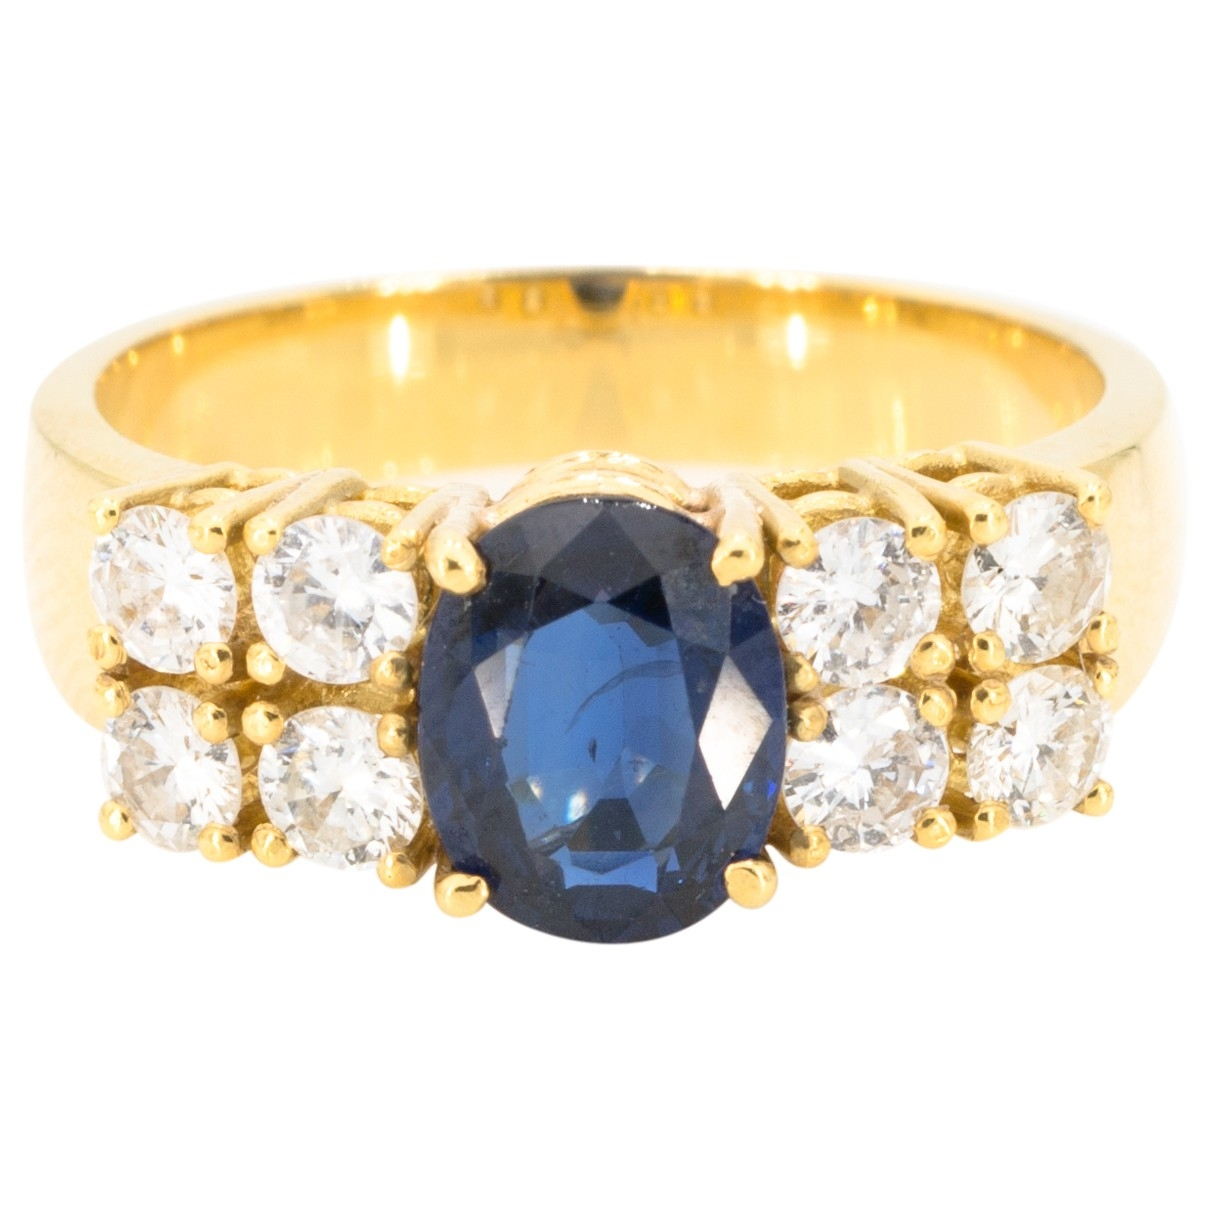 Non Signe / Unsigned Saphir Ring in  Gelb Gelbgold